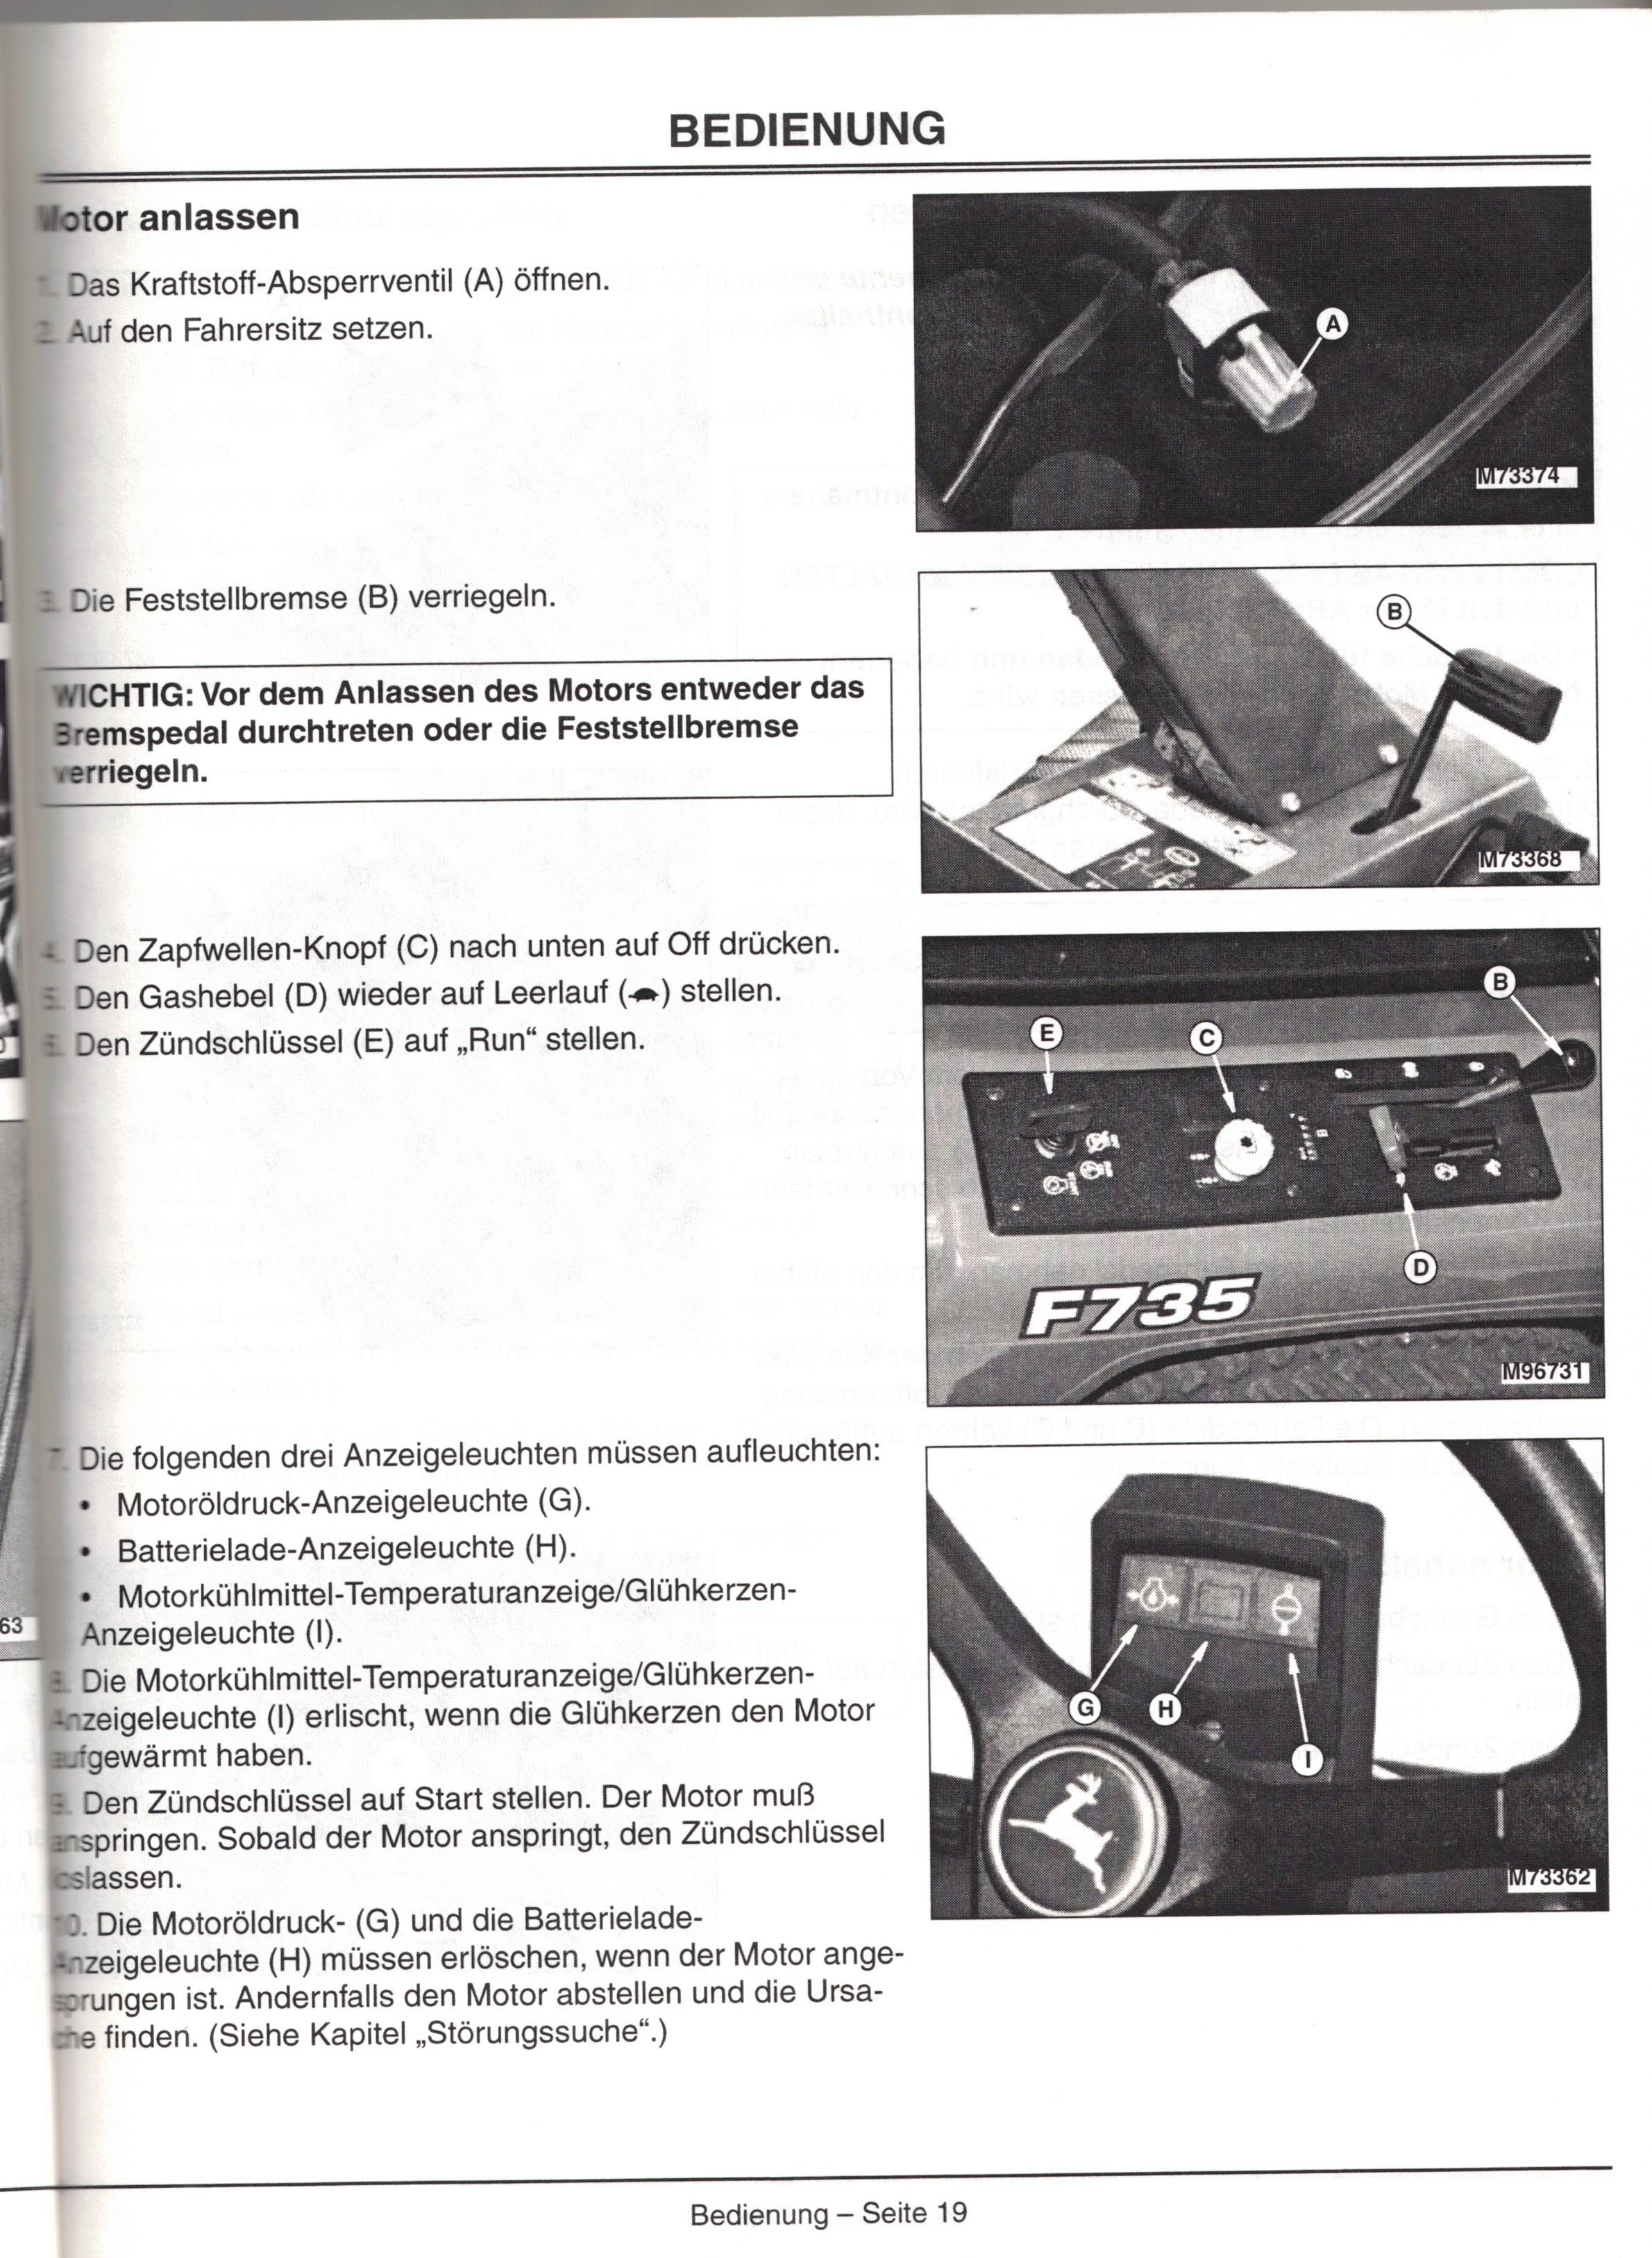 Bedienungsanleitung Kompaktfrontmäher John Deere F735